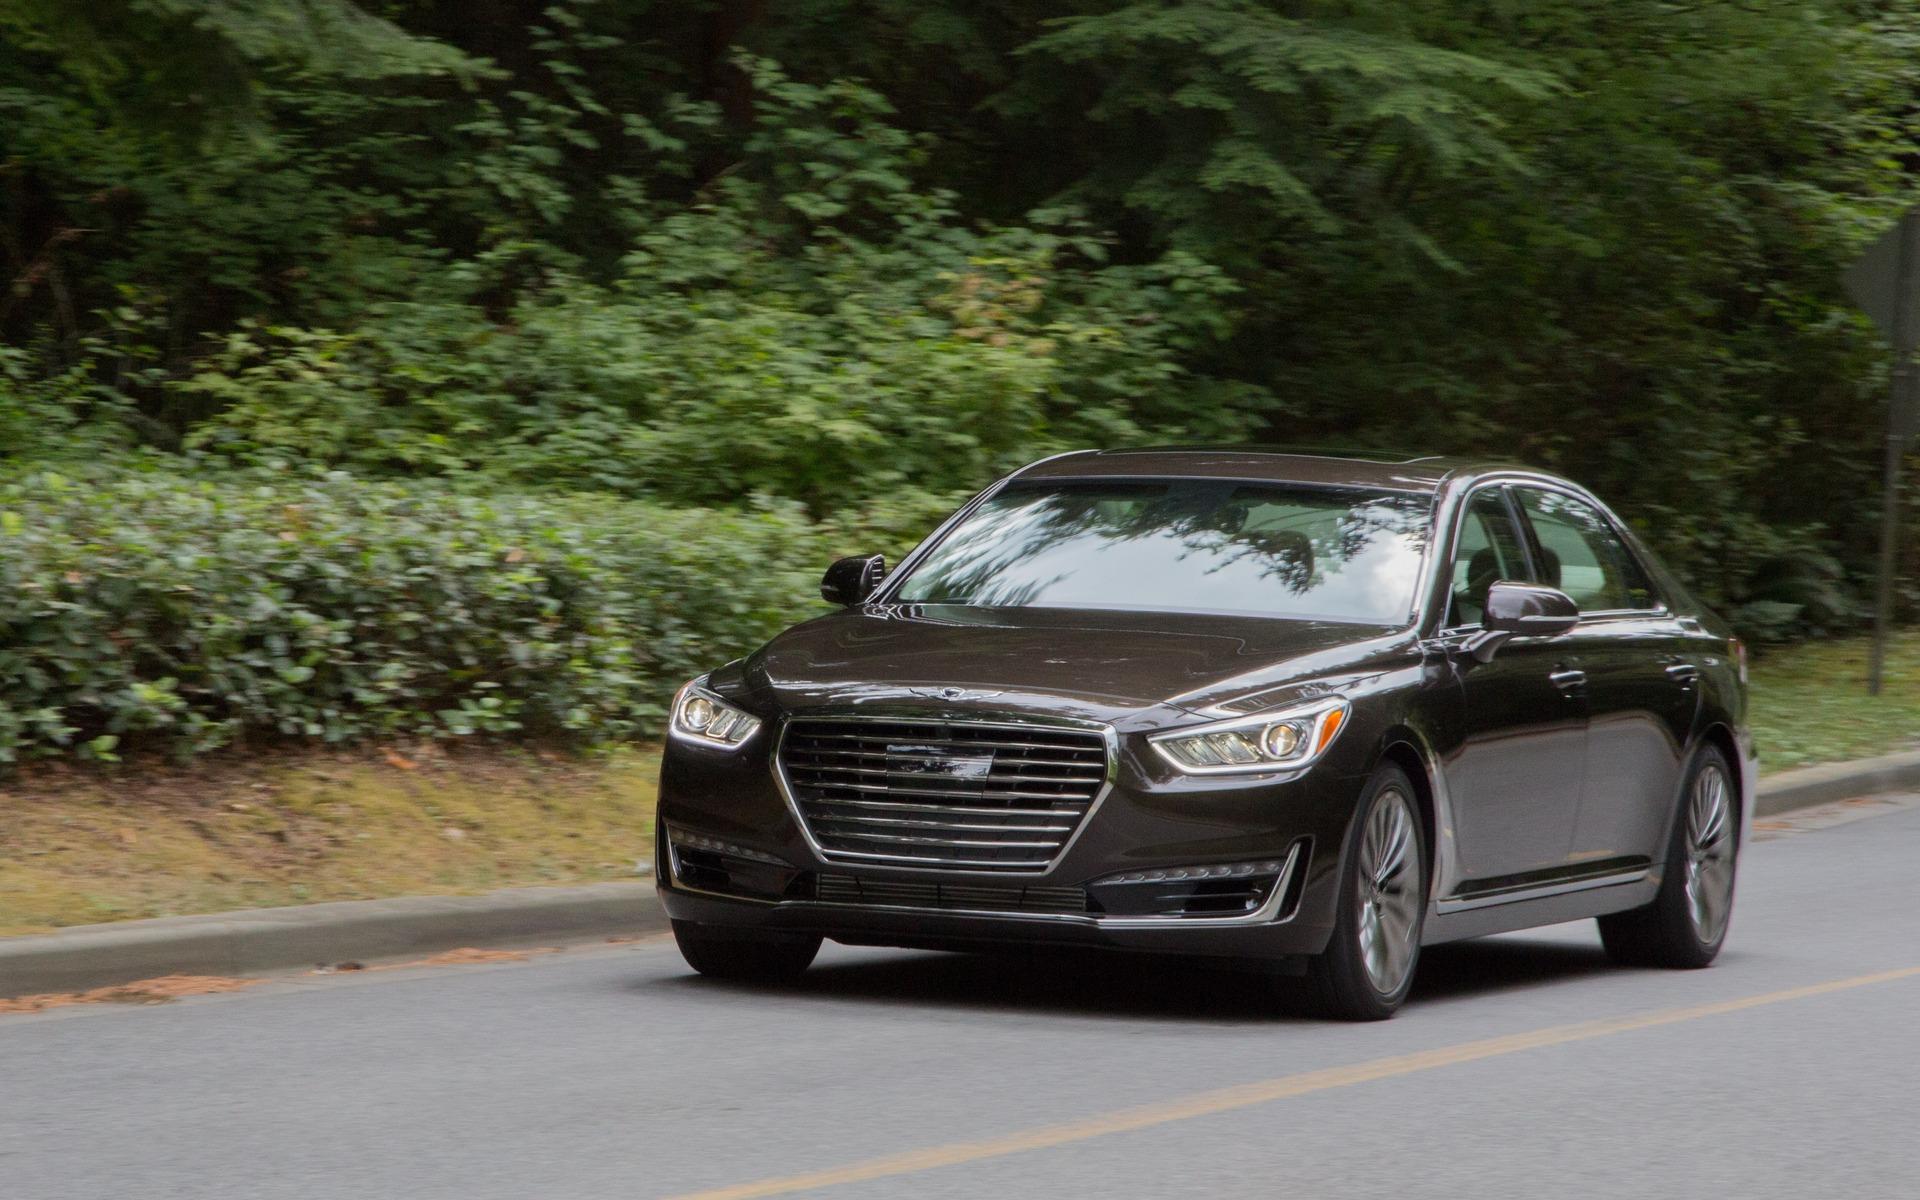 Genesis, Kia And Hyundai Make All Korean J.D. Power Quality Podium